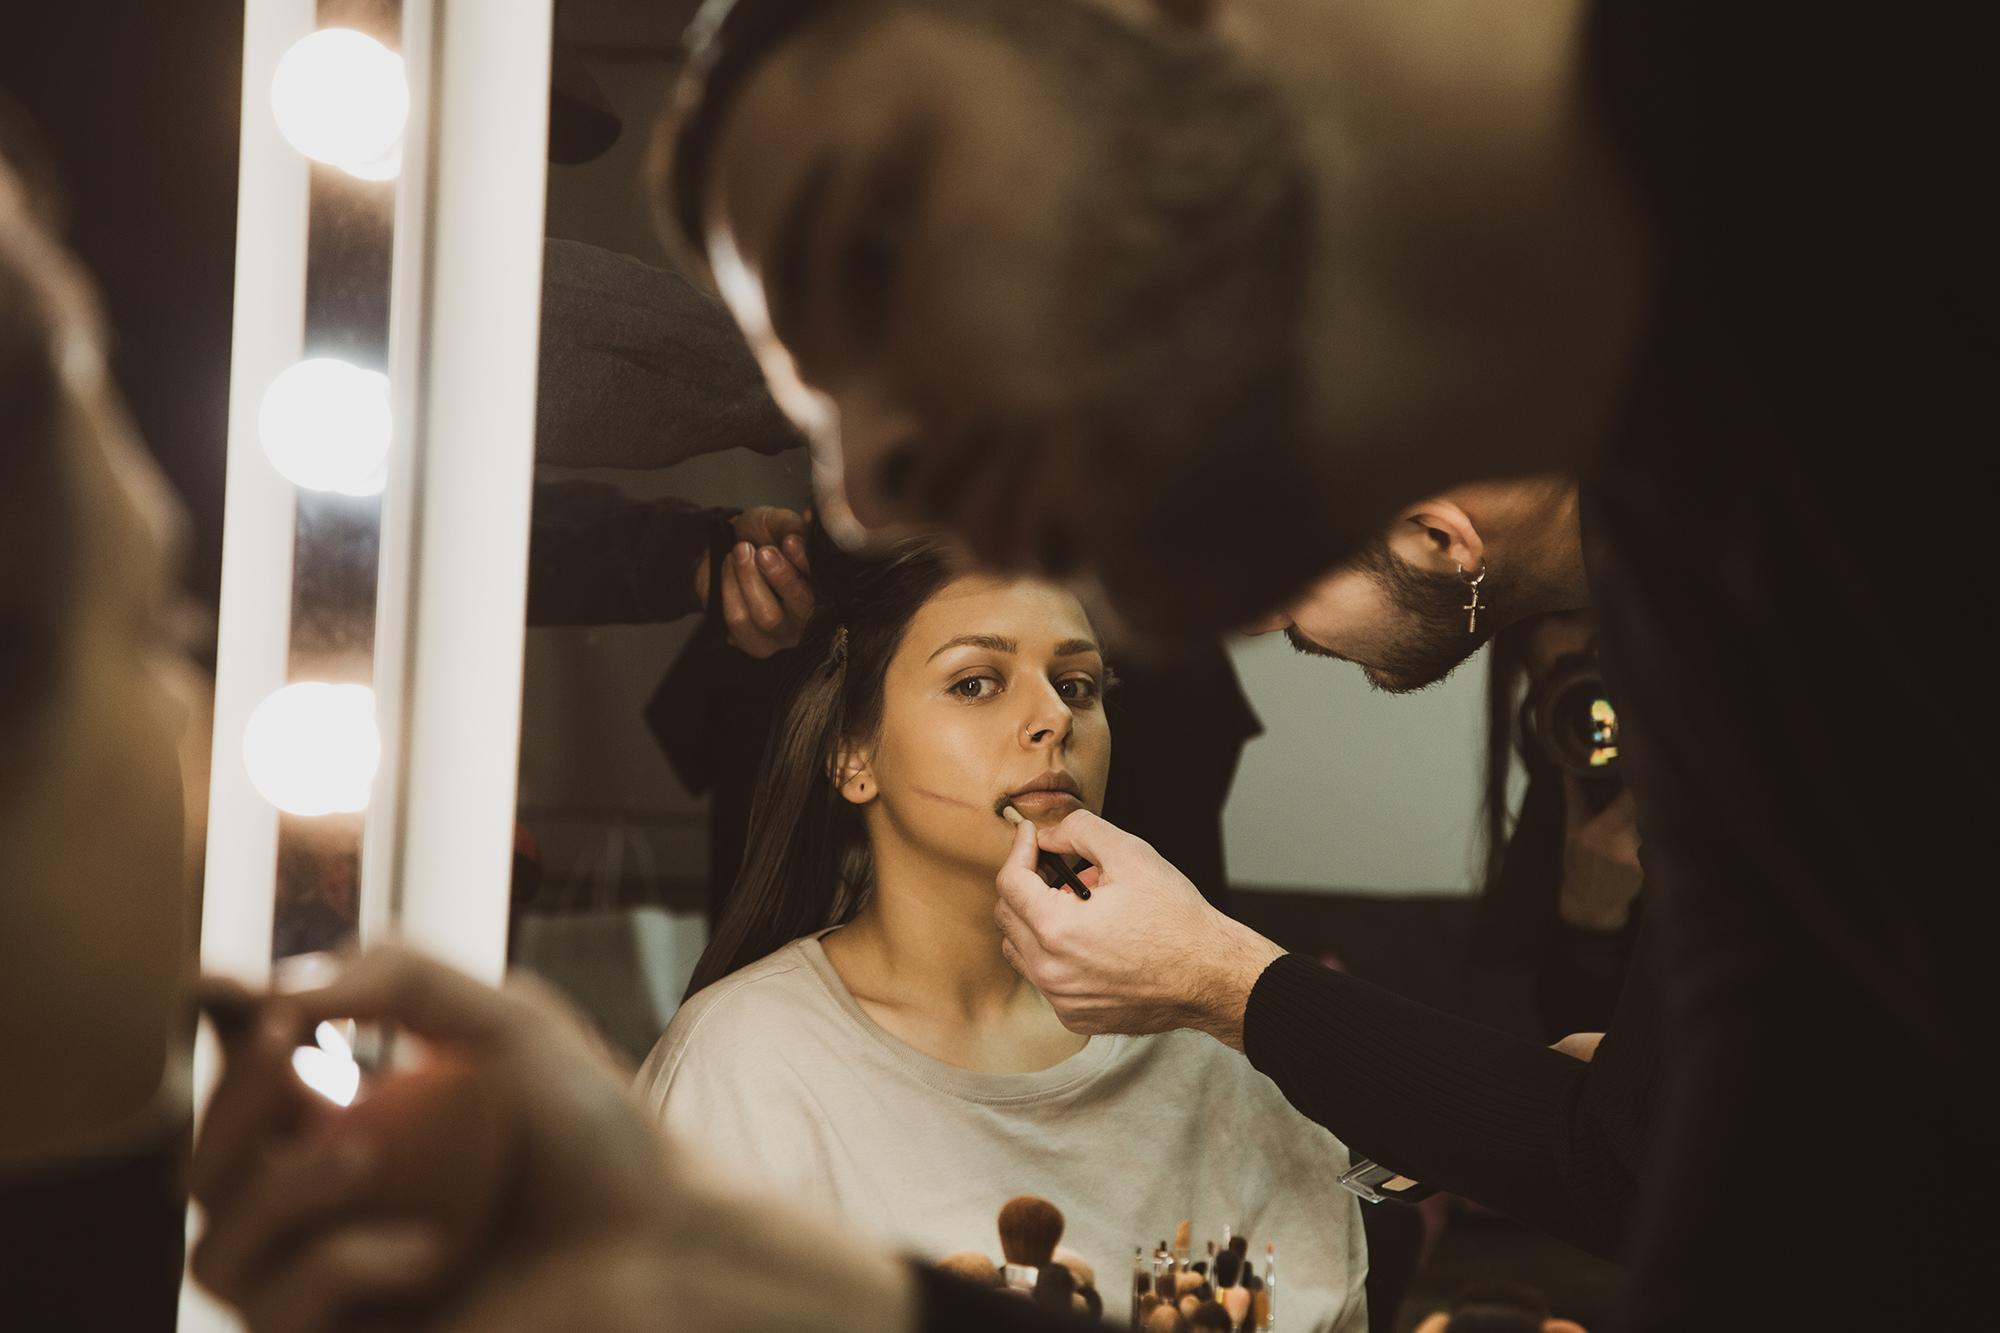 VICTORIA_Eurovision_2020_Video_Backstage_Lora_Musheva